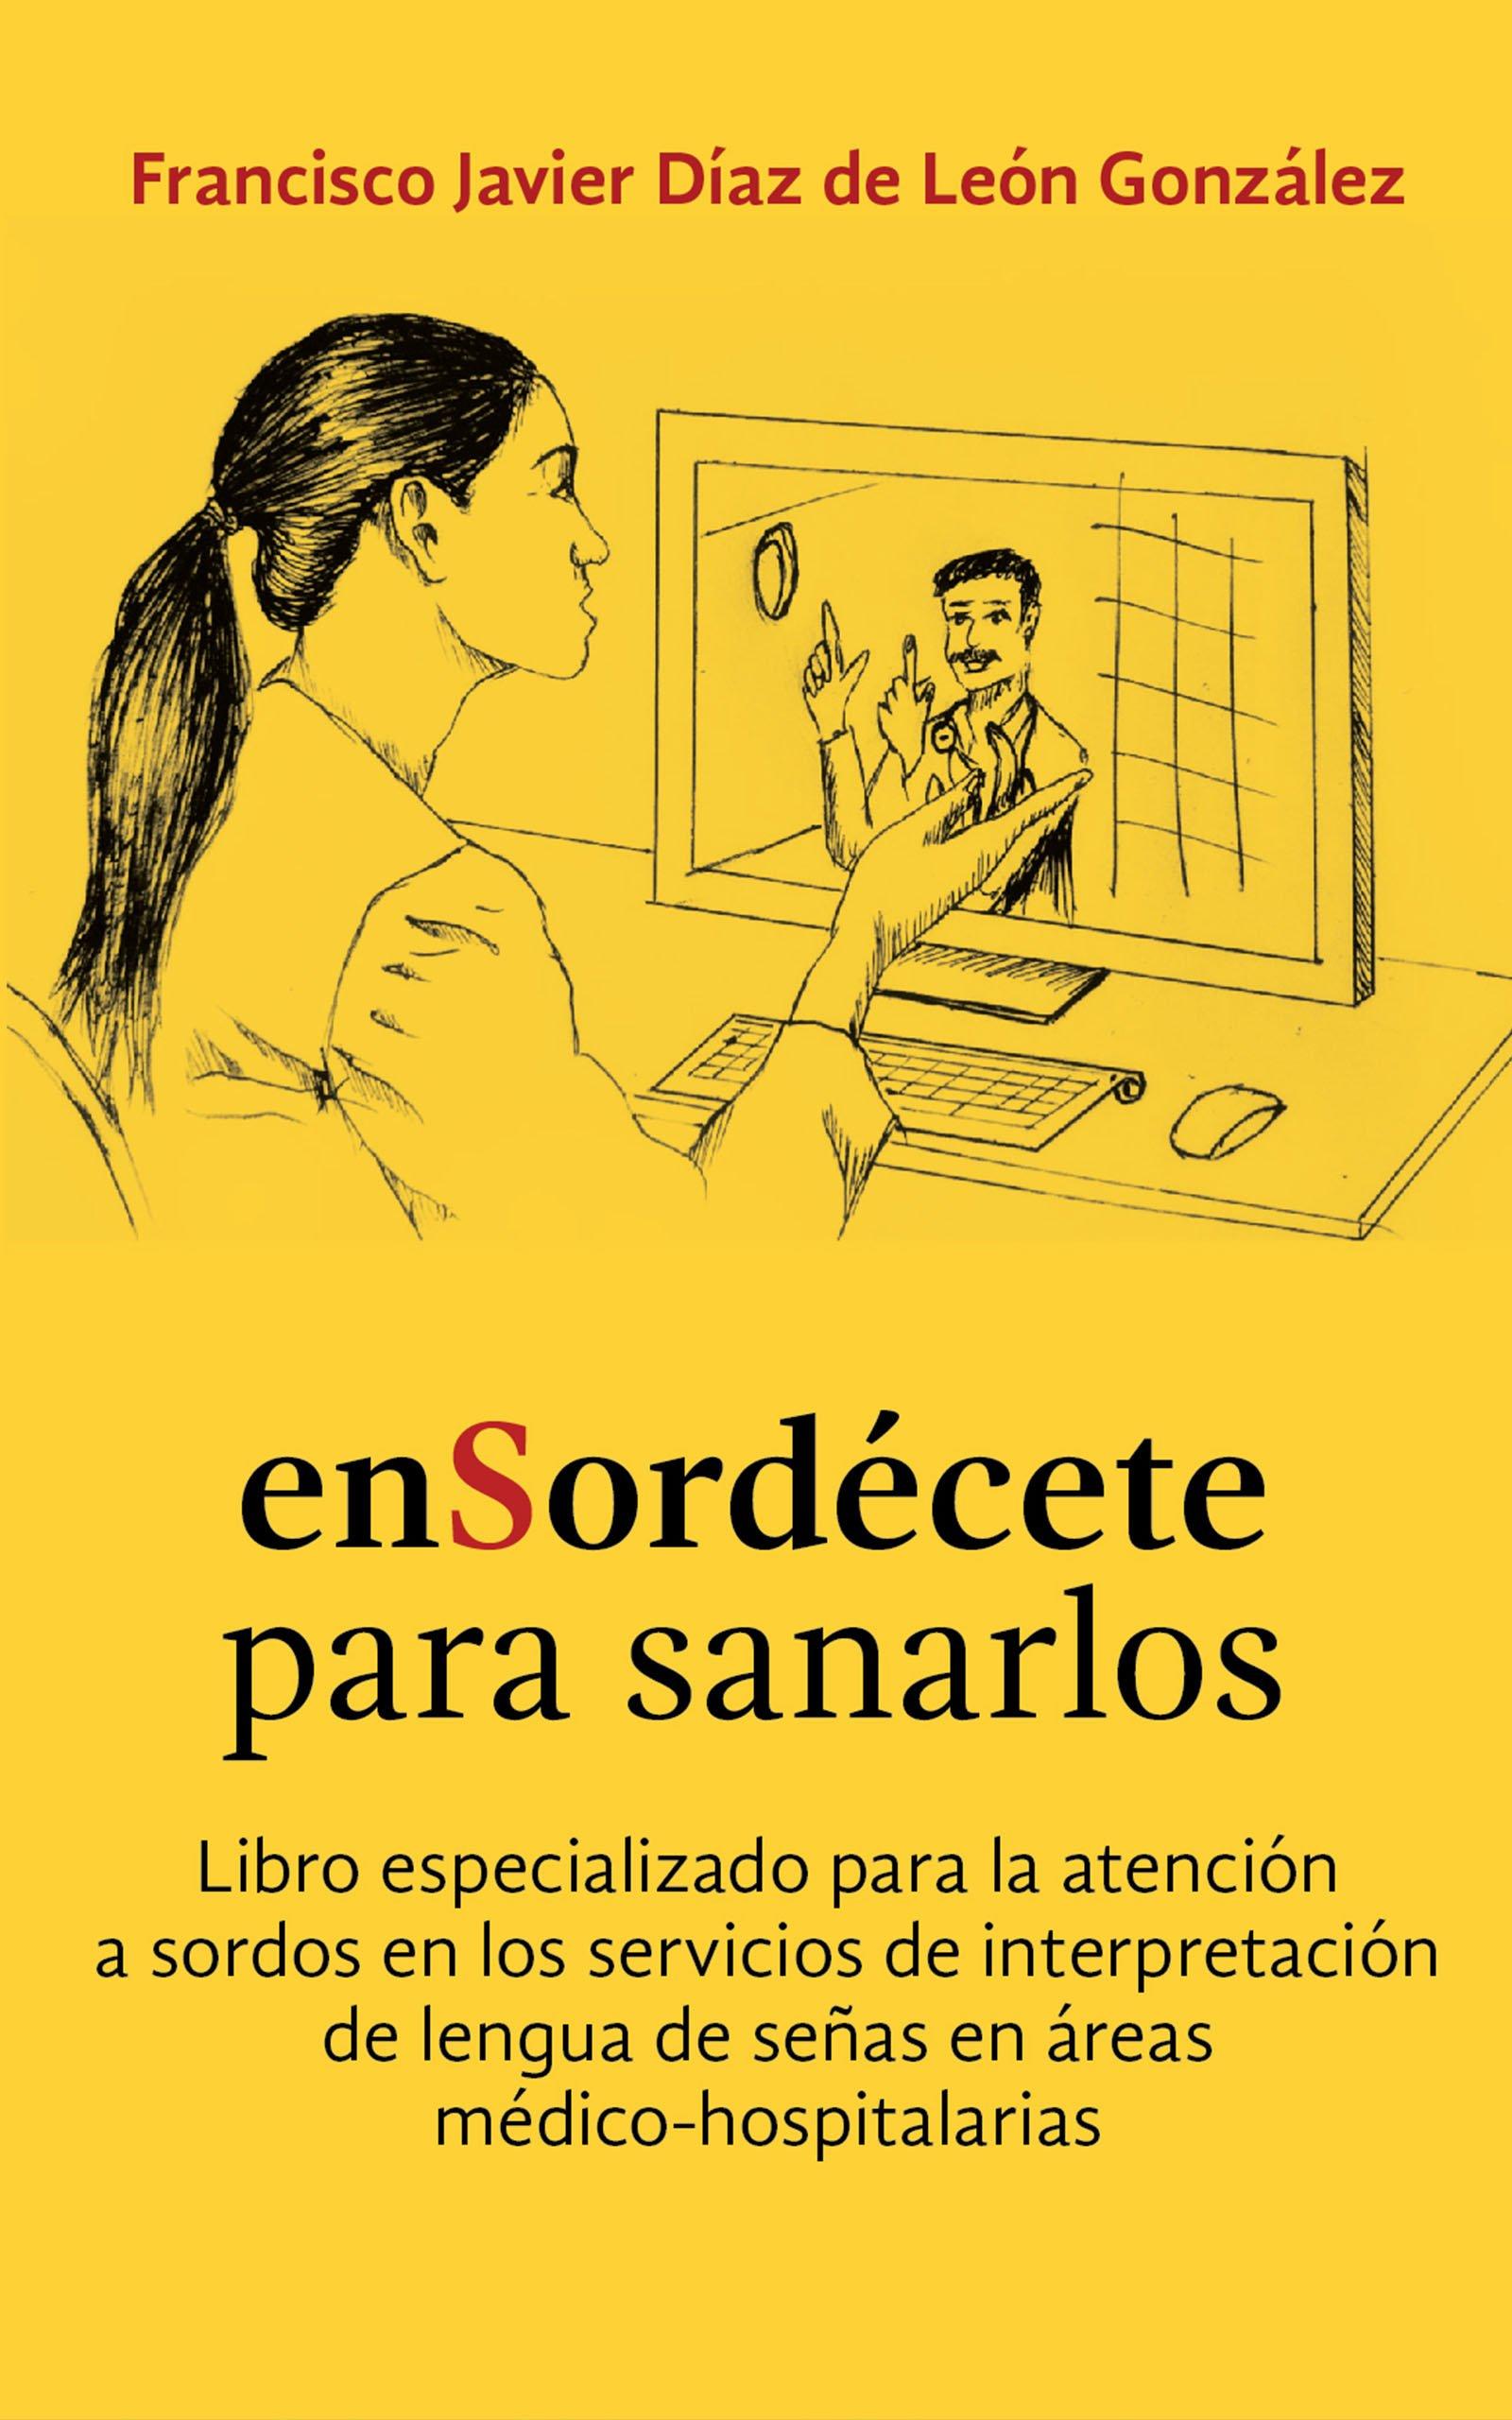 enSordécete para sanarlos, de Francisco Javier Díaz de León González